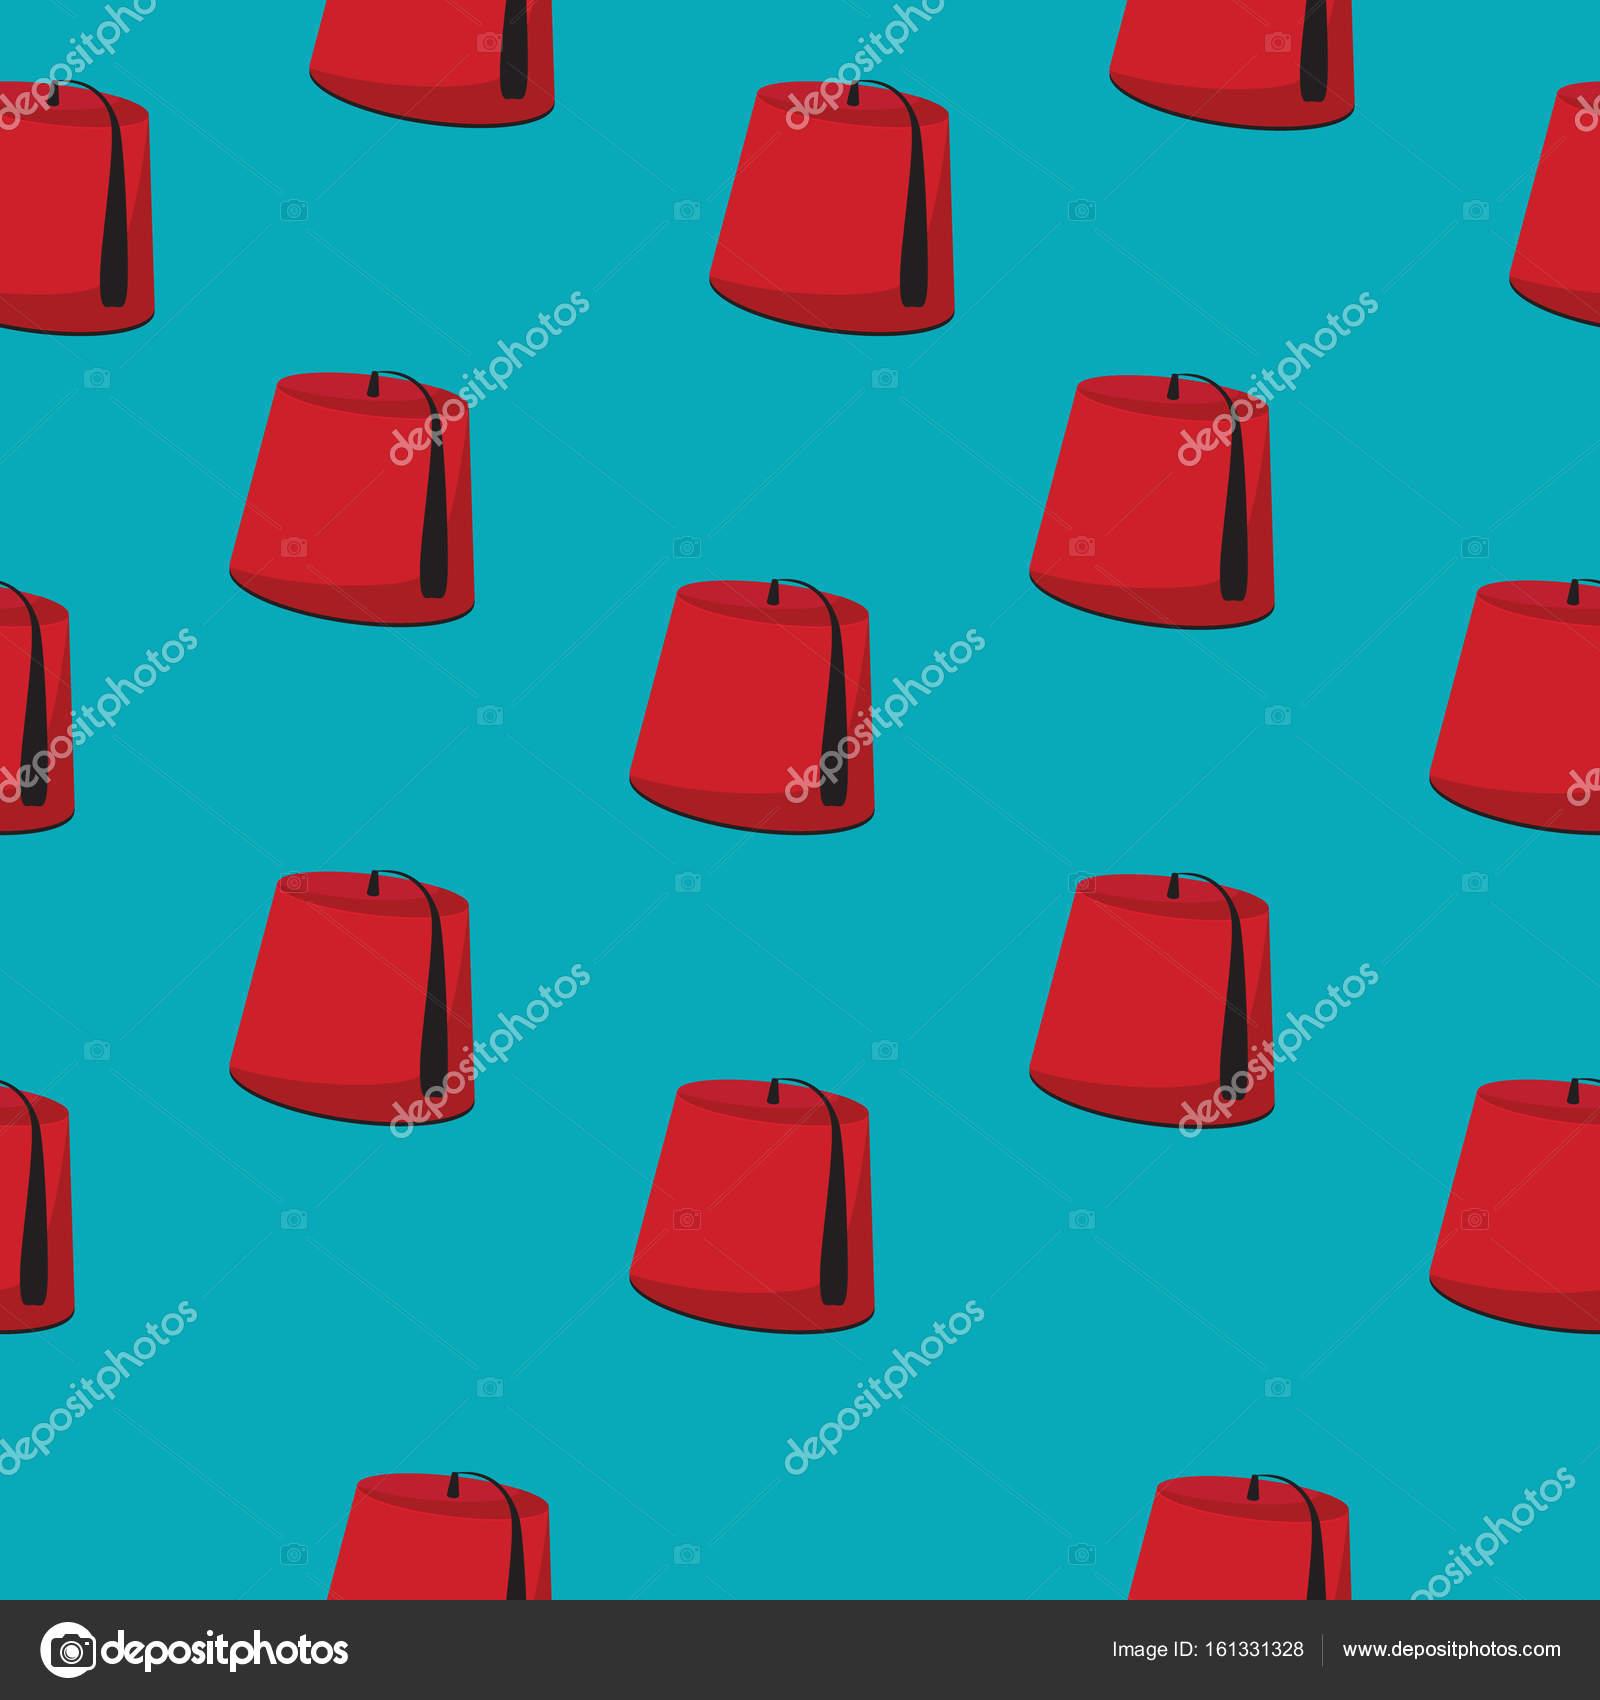 Patrón del sombrero Turco — Foto de stock © viktorijareut  161331328 0b4d20f174f